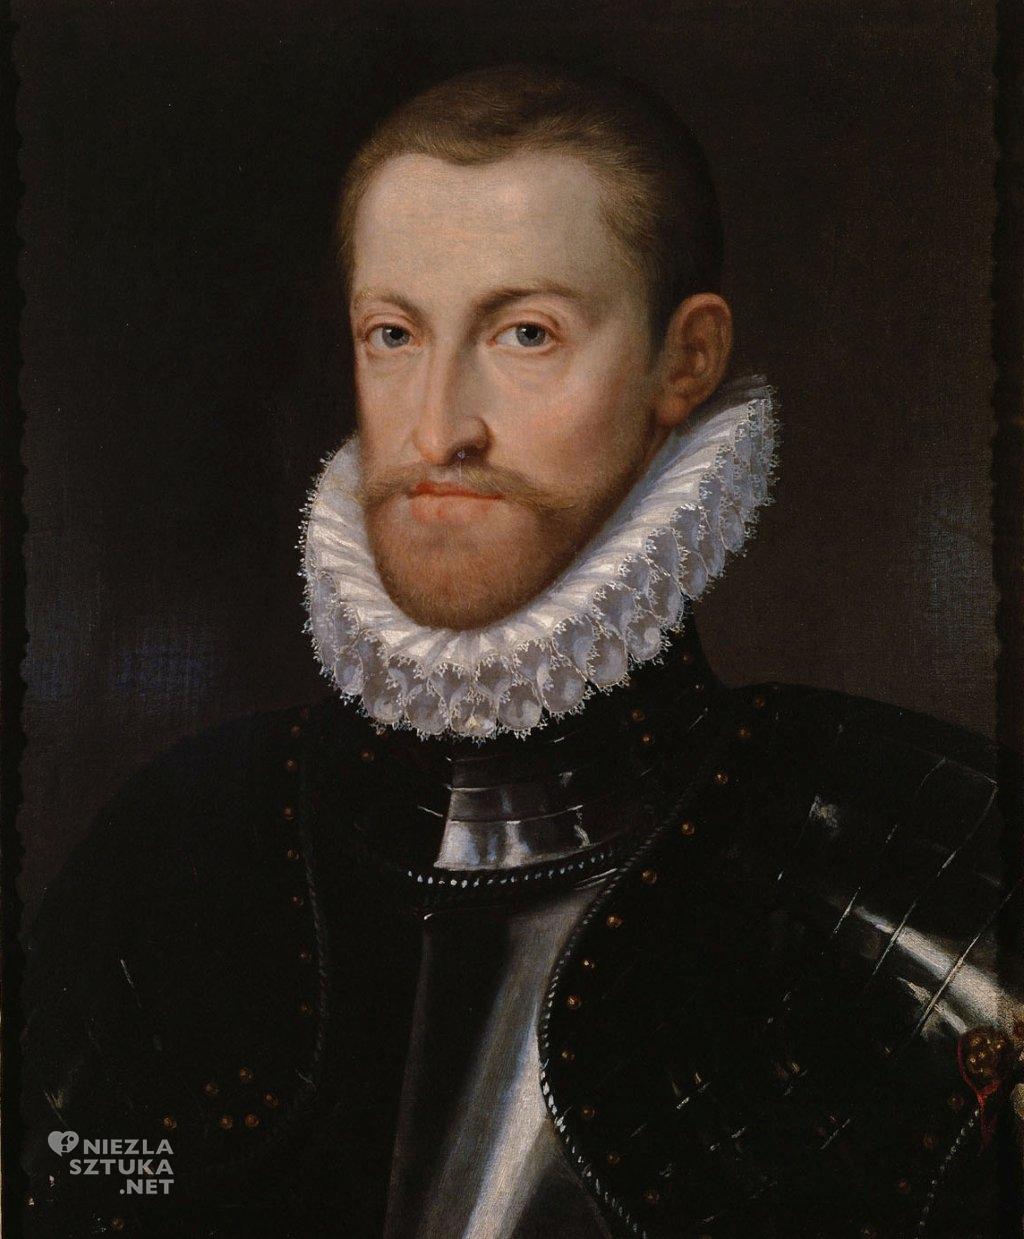 cesarz Rudolf II Habsburg, Martino Rota, Niezła sztuka